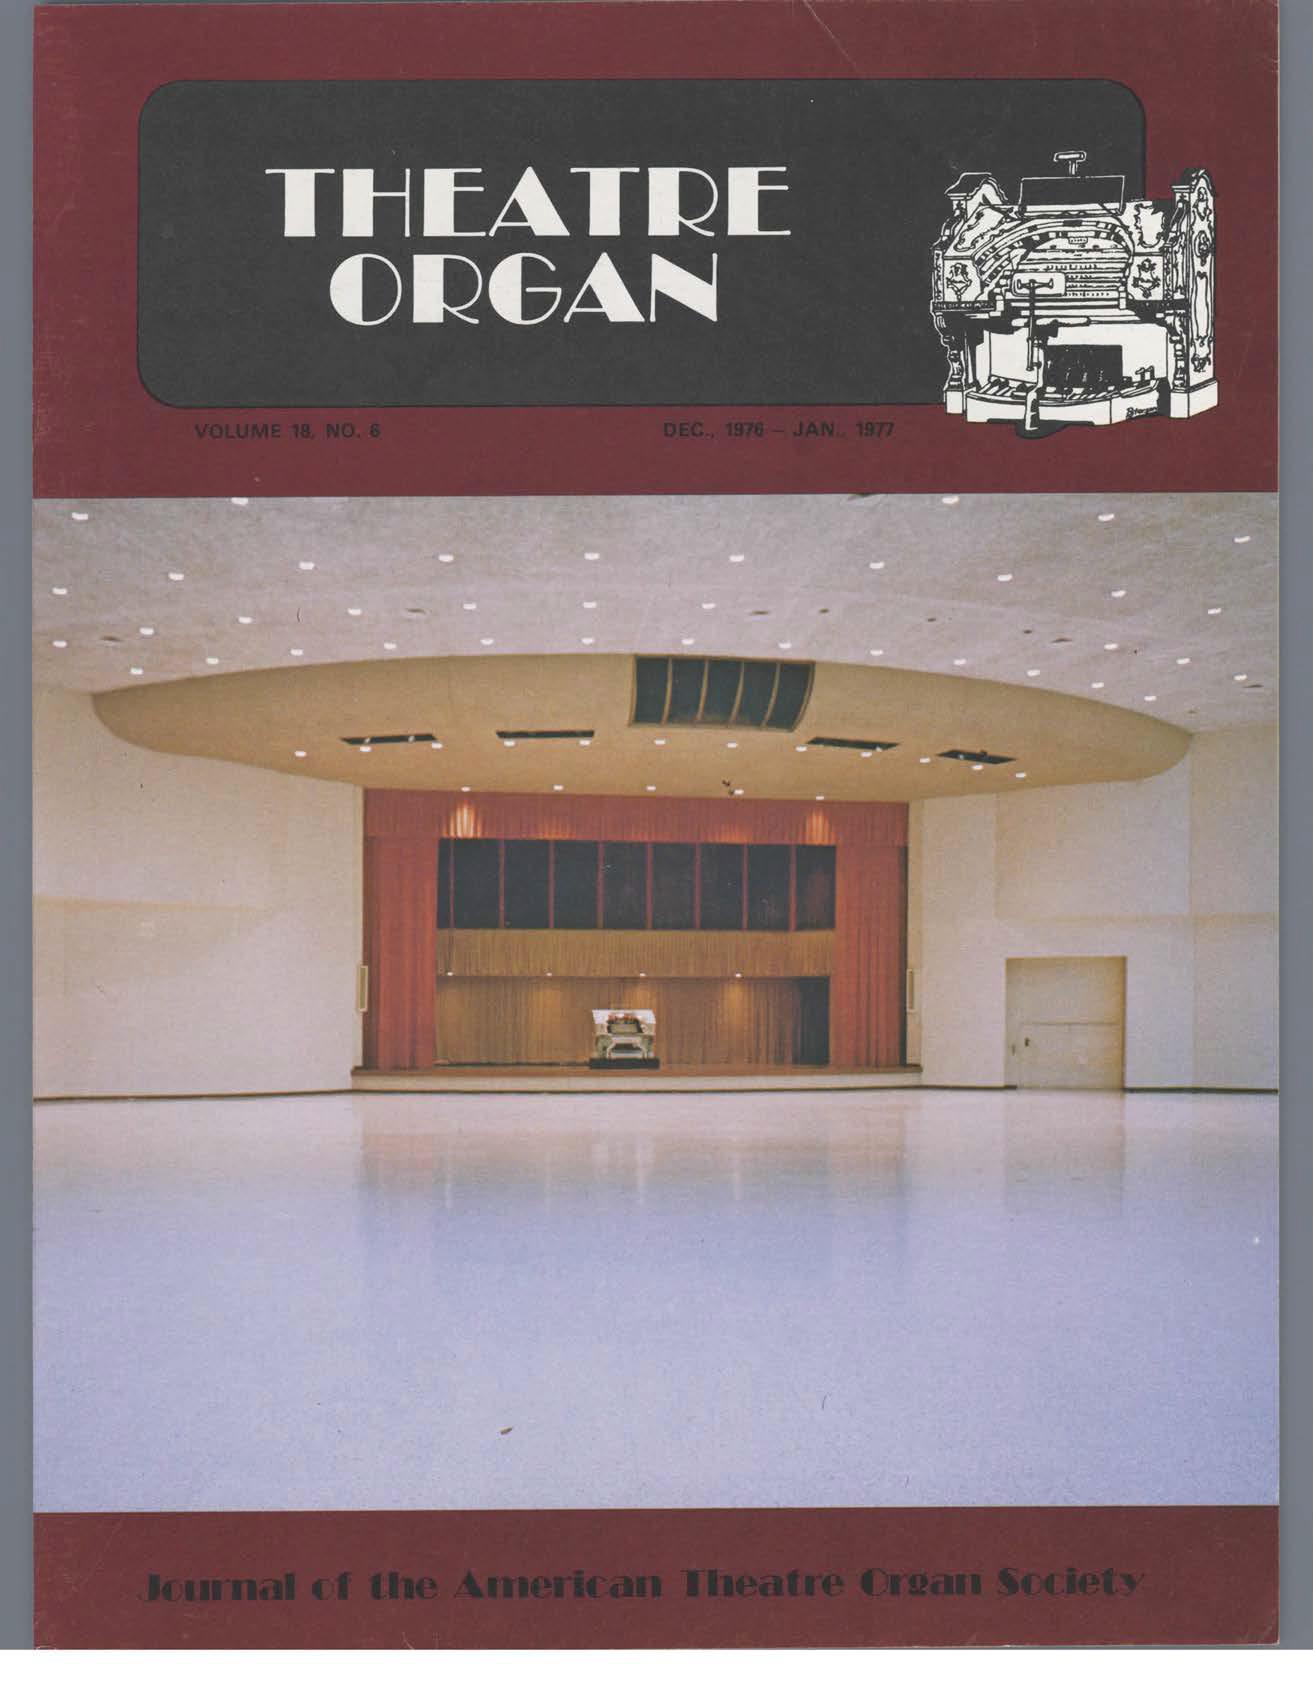 Theatre Organ, December - January 1976, Volume 18, Number 6